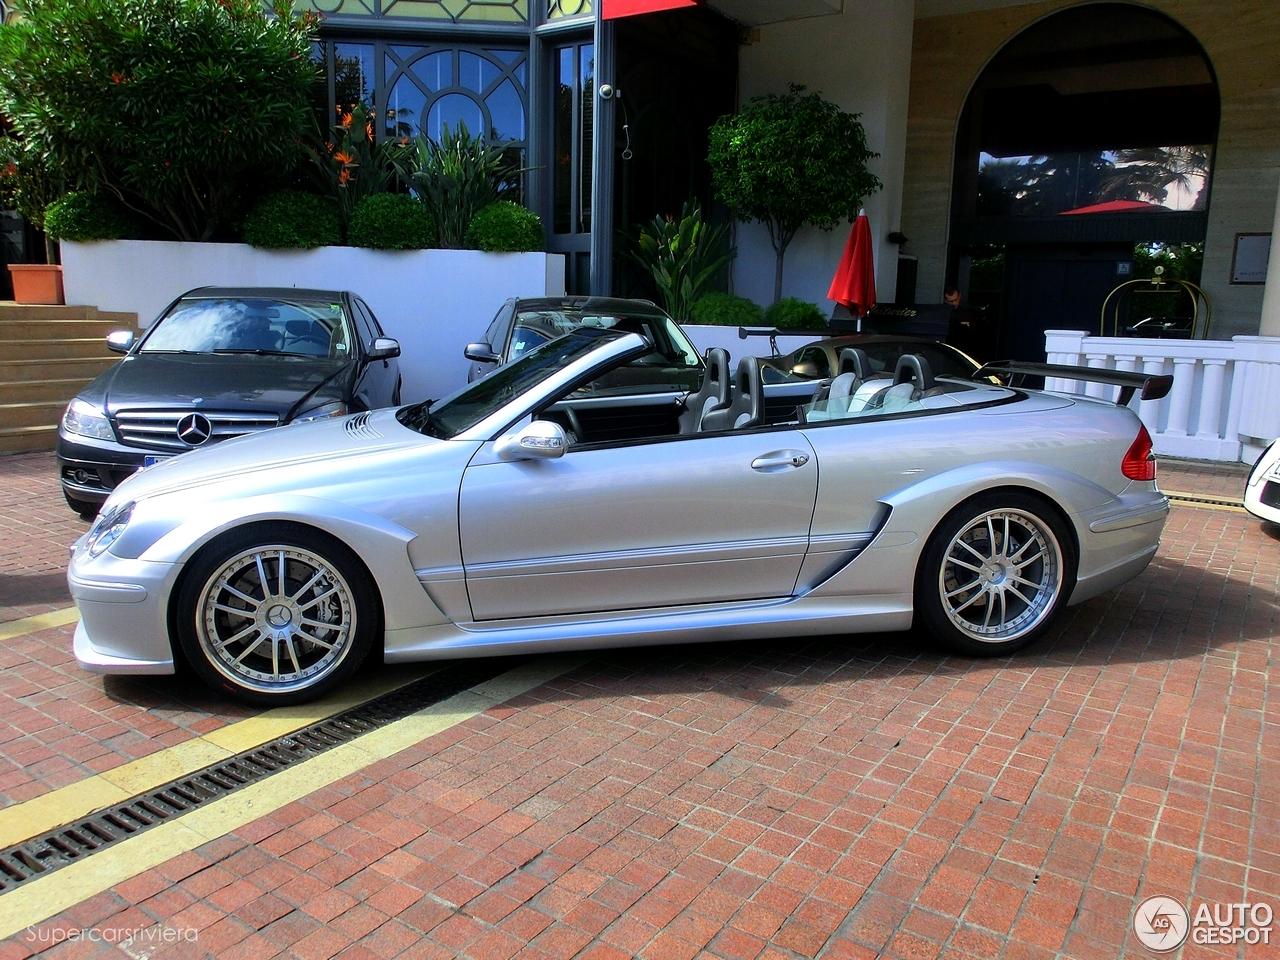 Mercedes Benz Clk Dtm Amg Cabriolet 4 May 2014 Autogespot